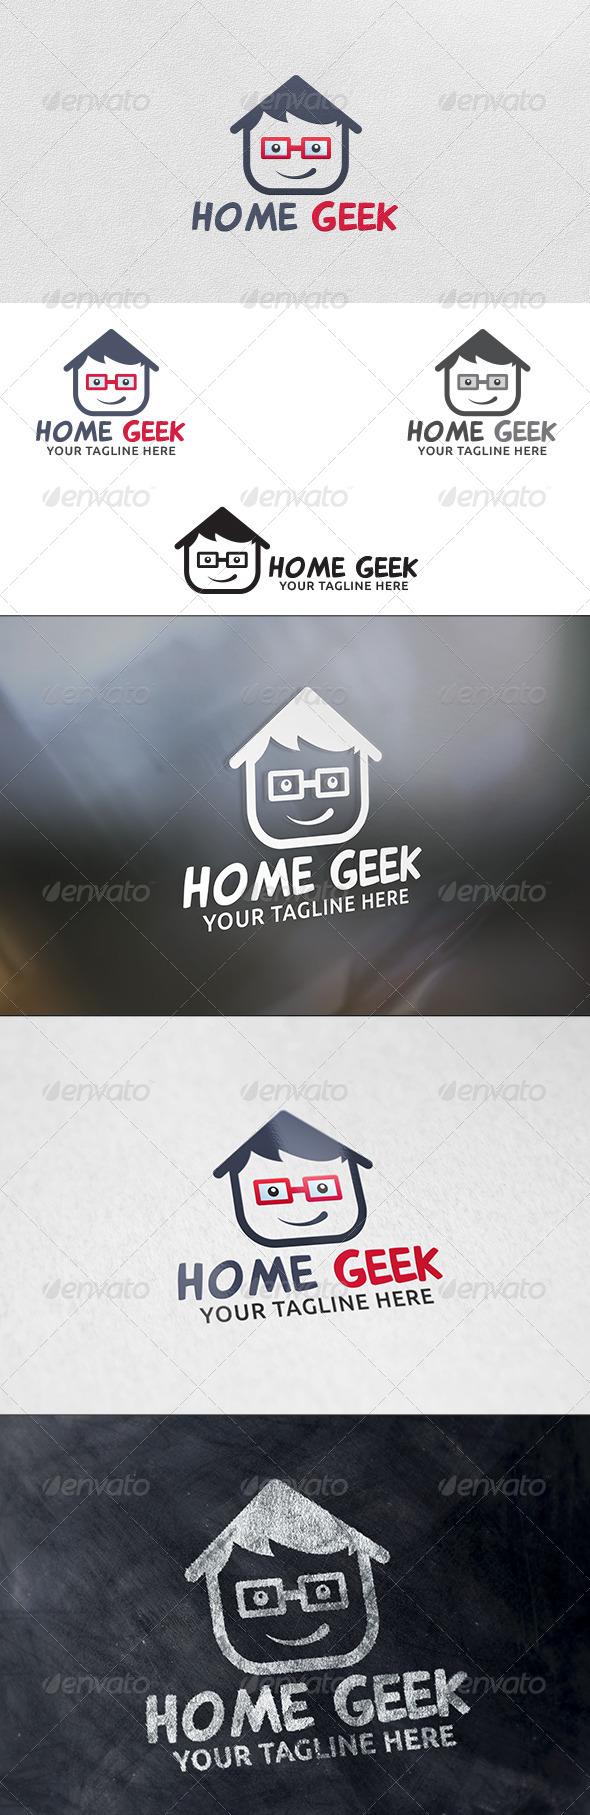 Home Geek - Logo Template - Humans Logo Templates